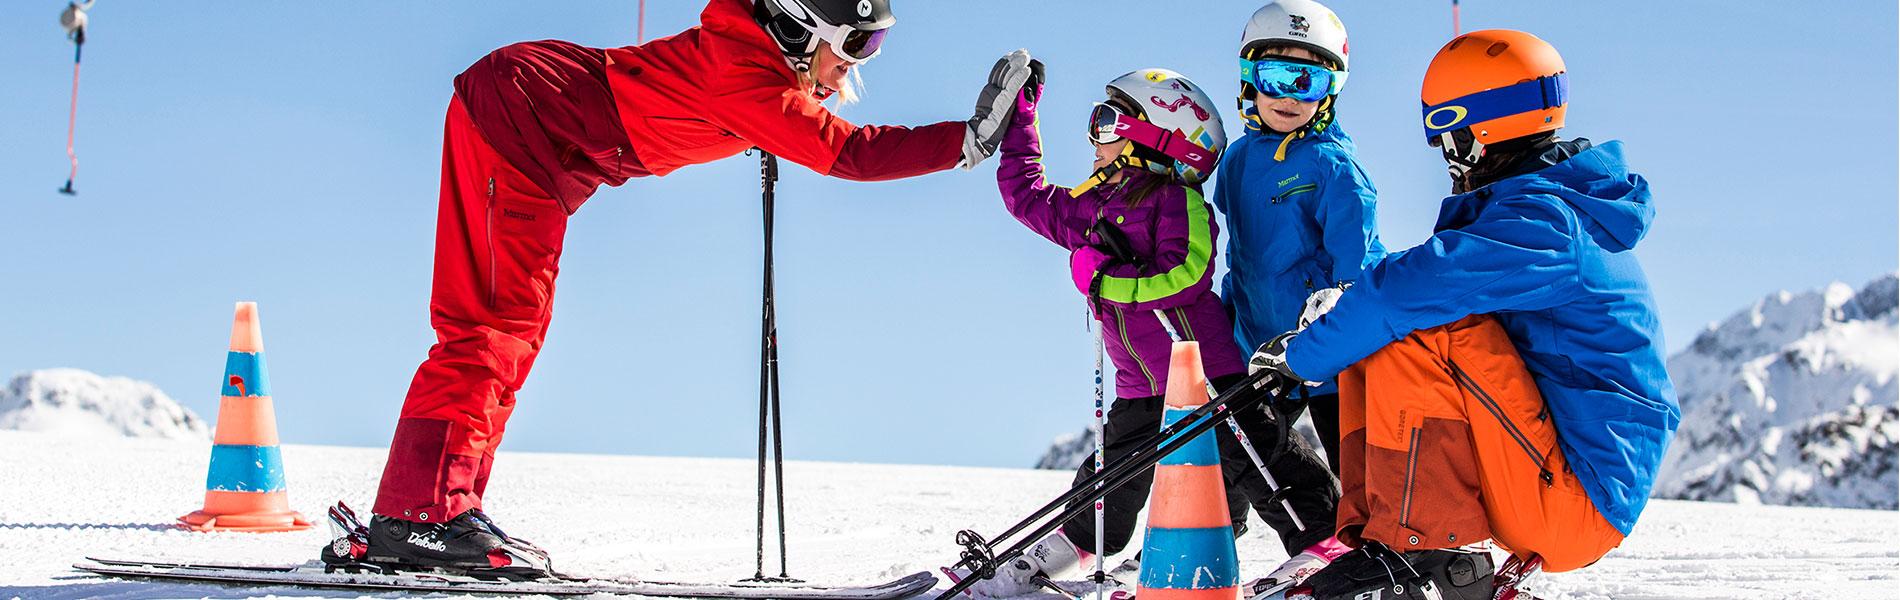 Skiurlaub mit der Familie im Stubaital - 4 Hotel Happy Stubai in Neustift Tirol Austria (1)